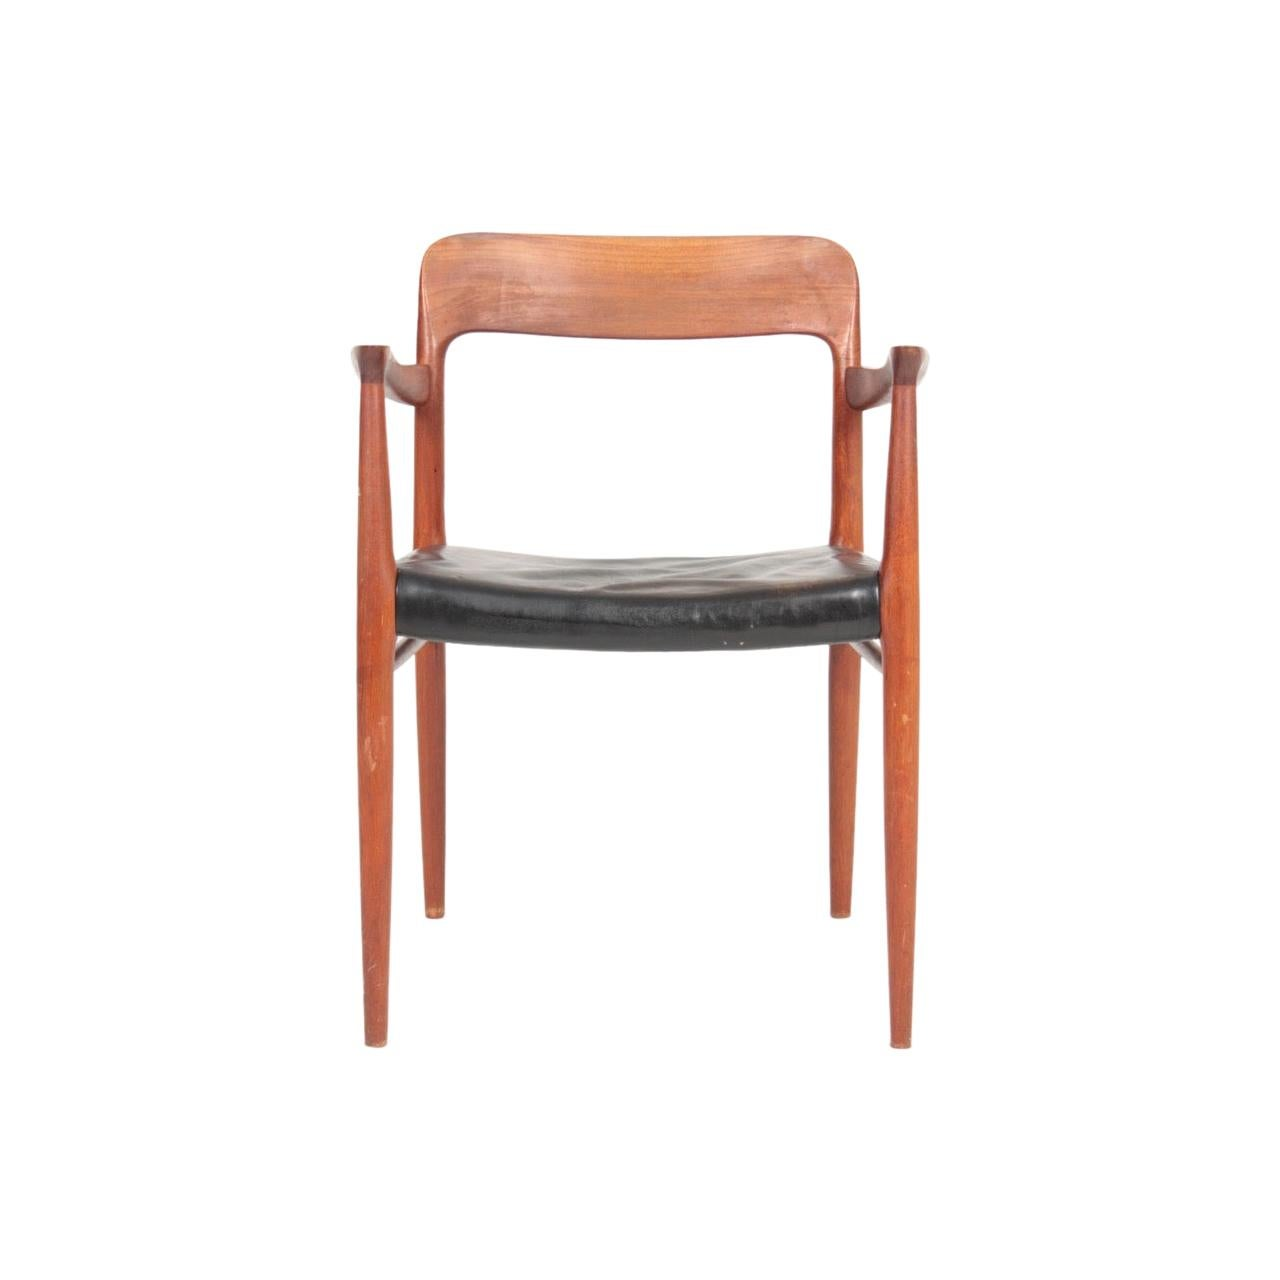 Elegant Midcentury Armchair in Teak and Patinated Leather by N.O Moeller